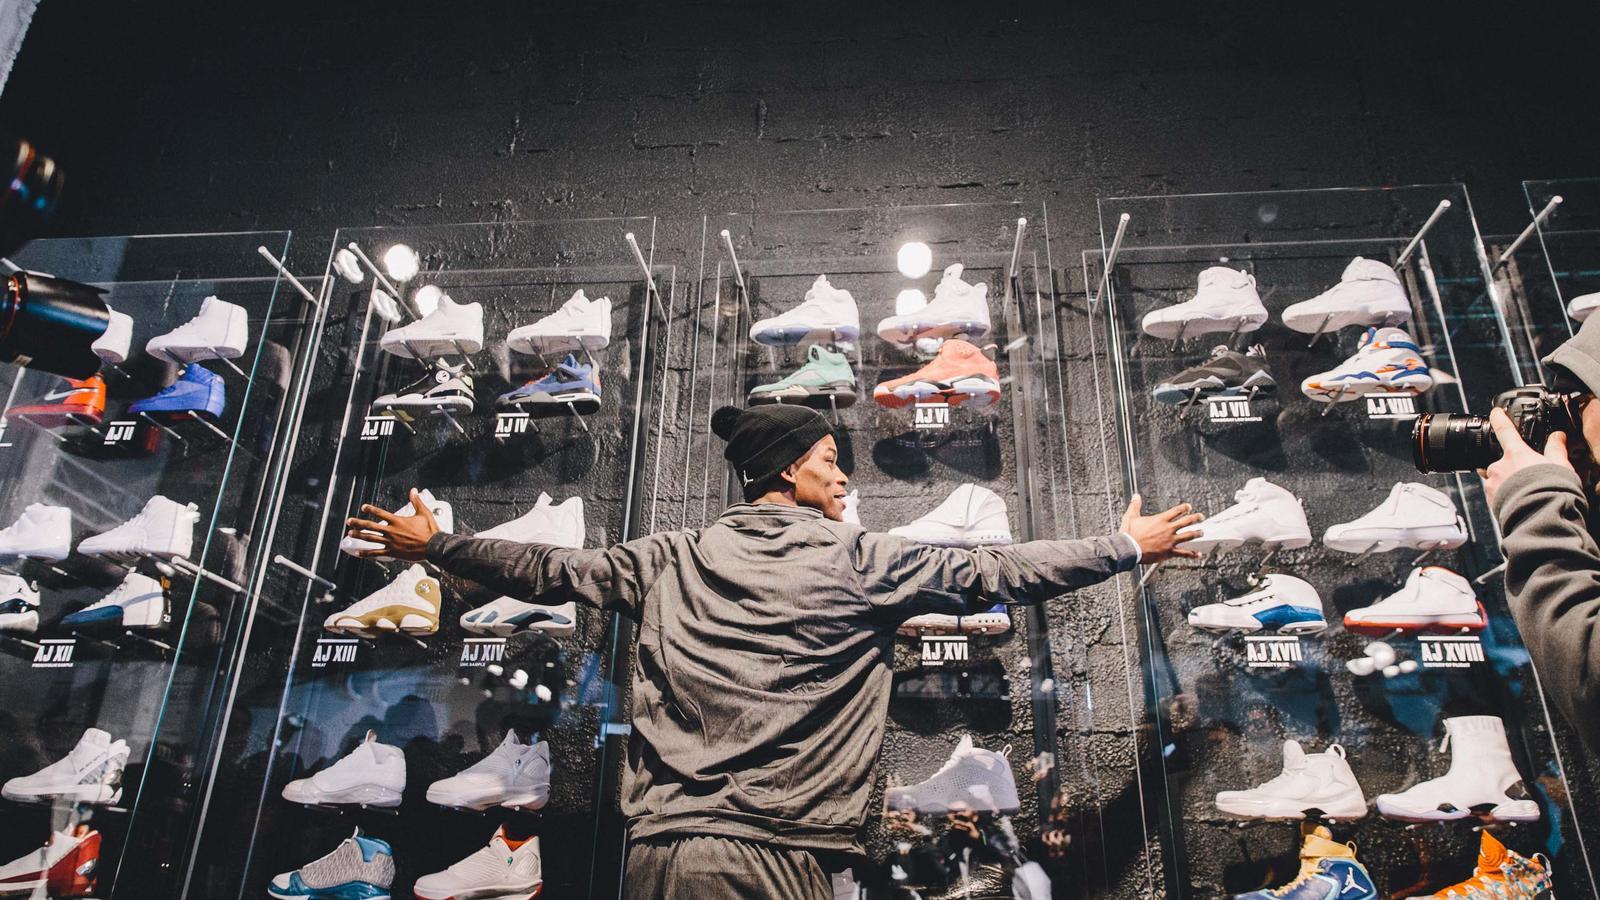 Nike Jordan Courtside 23 (AT0057 200) porównaj zanim kupisz